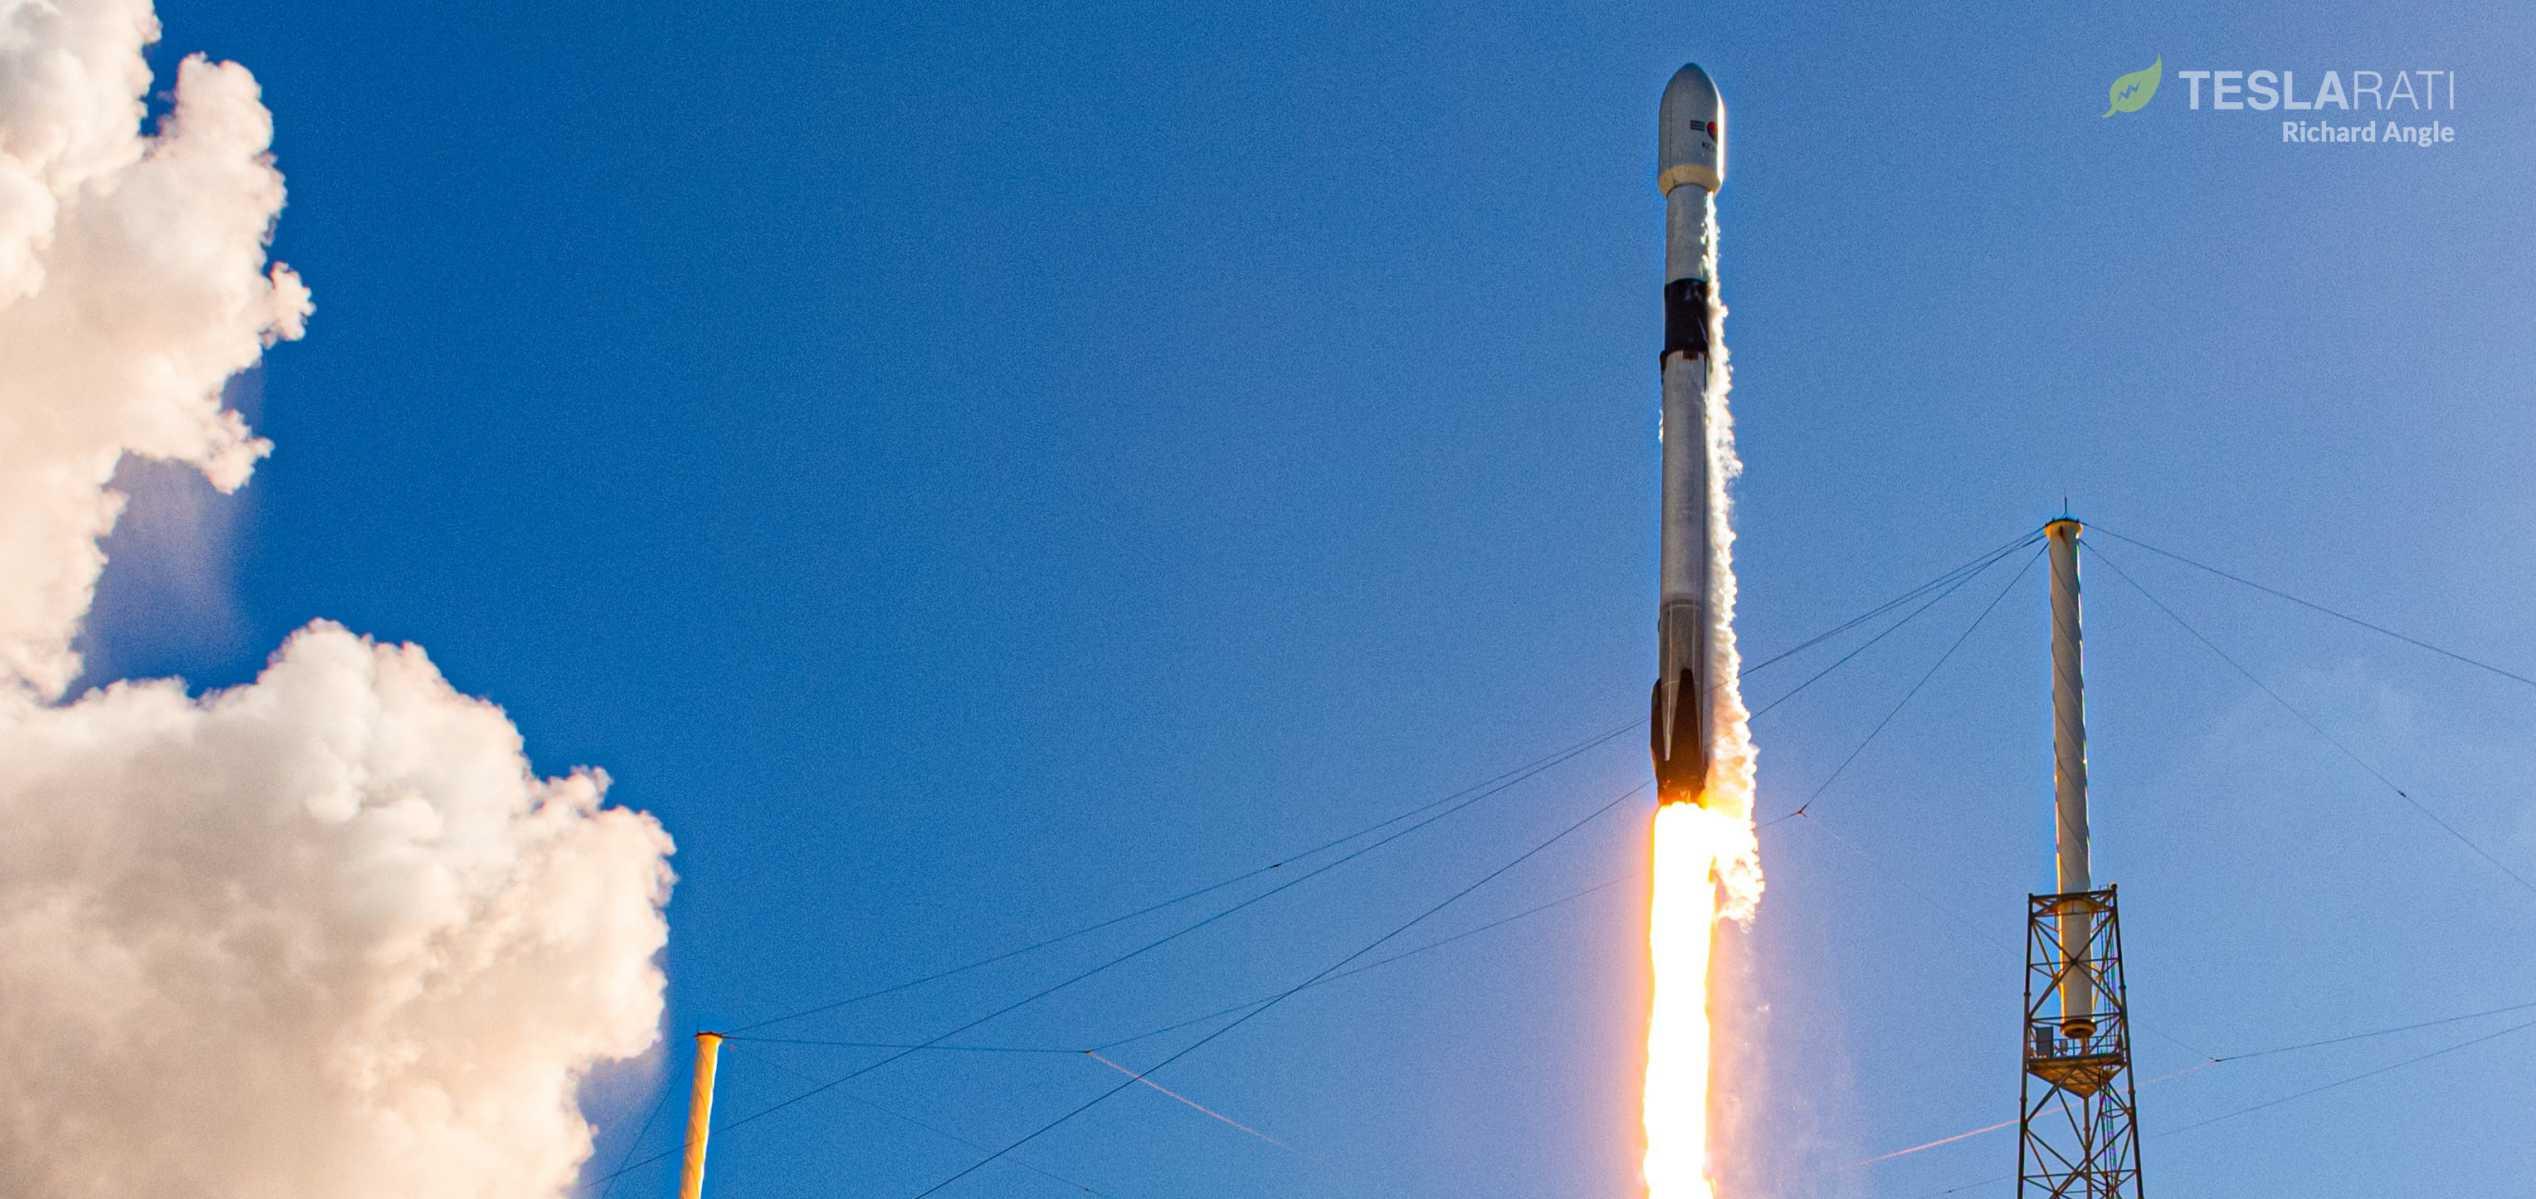 ANASIS II Falcon 9 B1058 072020 (Richard Angle) launch 4 crop 3 (c)